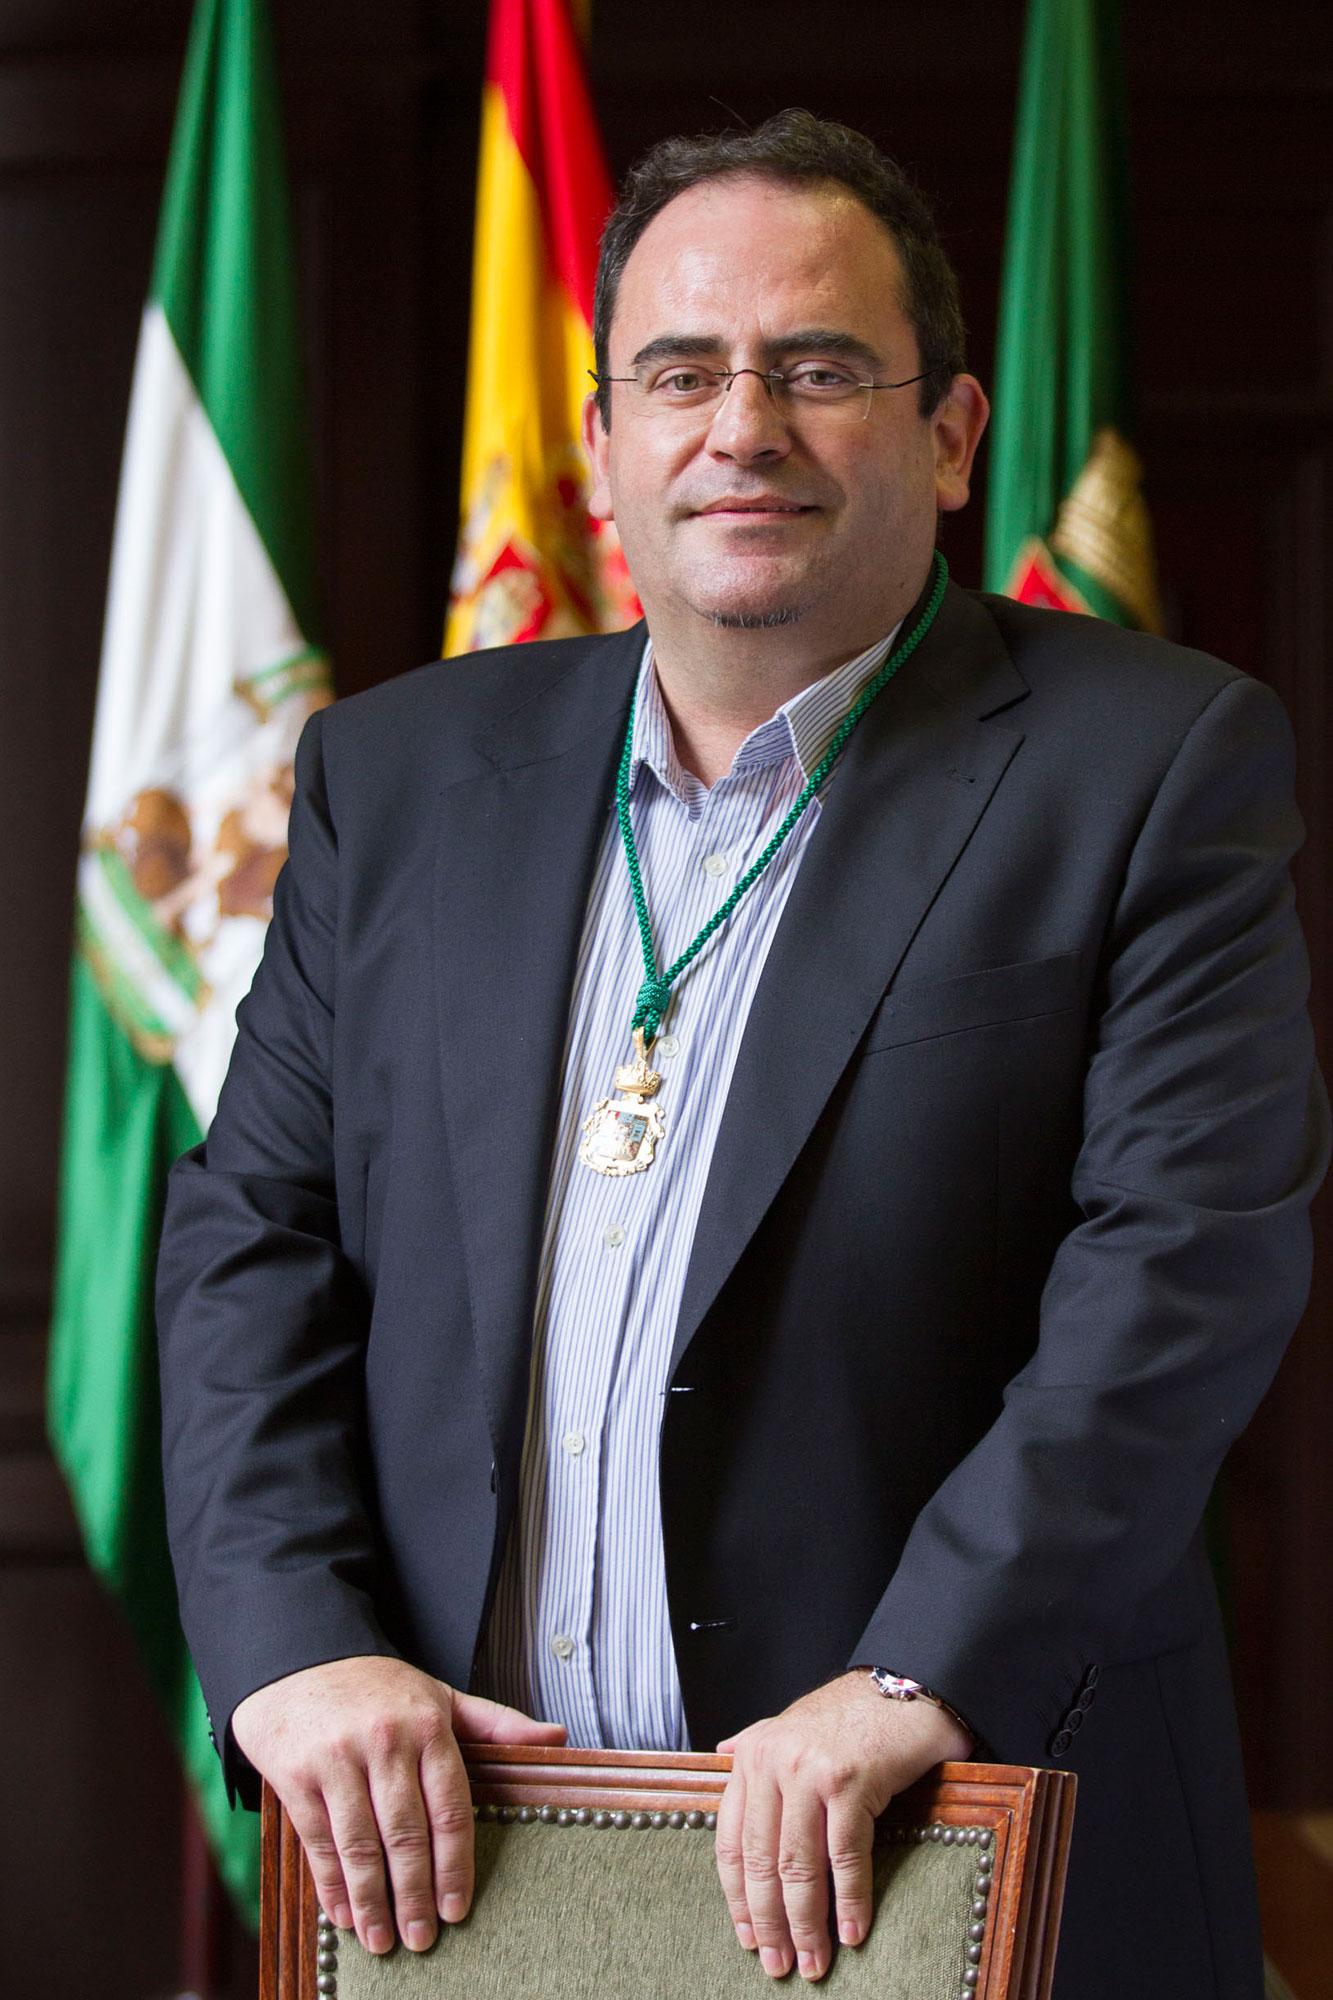 Francisco Joaquín Cortés García